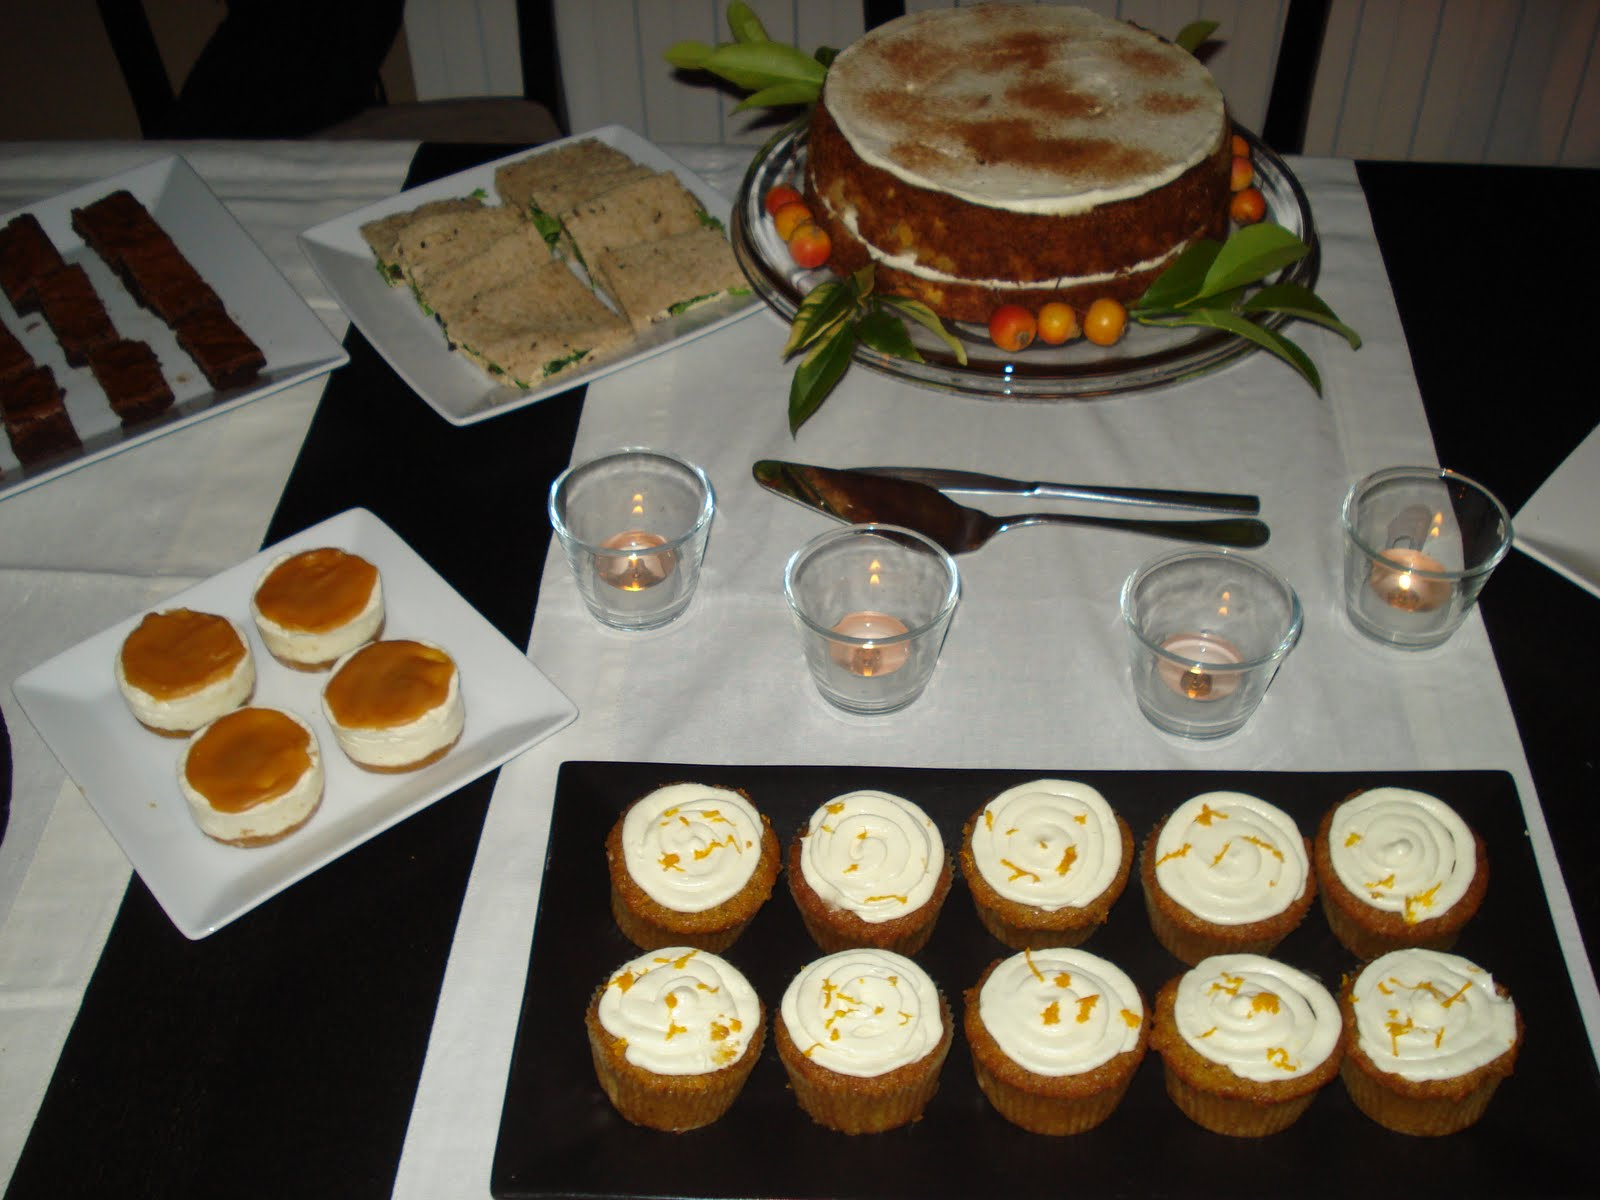 Madrid bakery caf recuperar la merienda - Recetas merienda cena informal ...